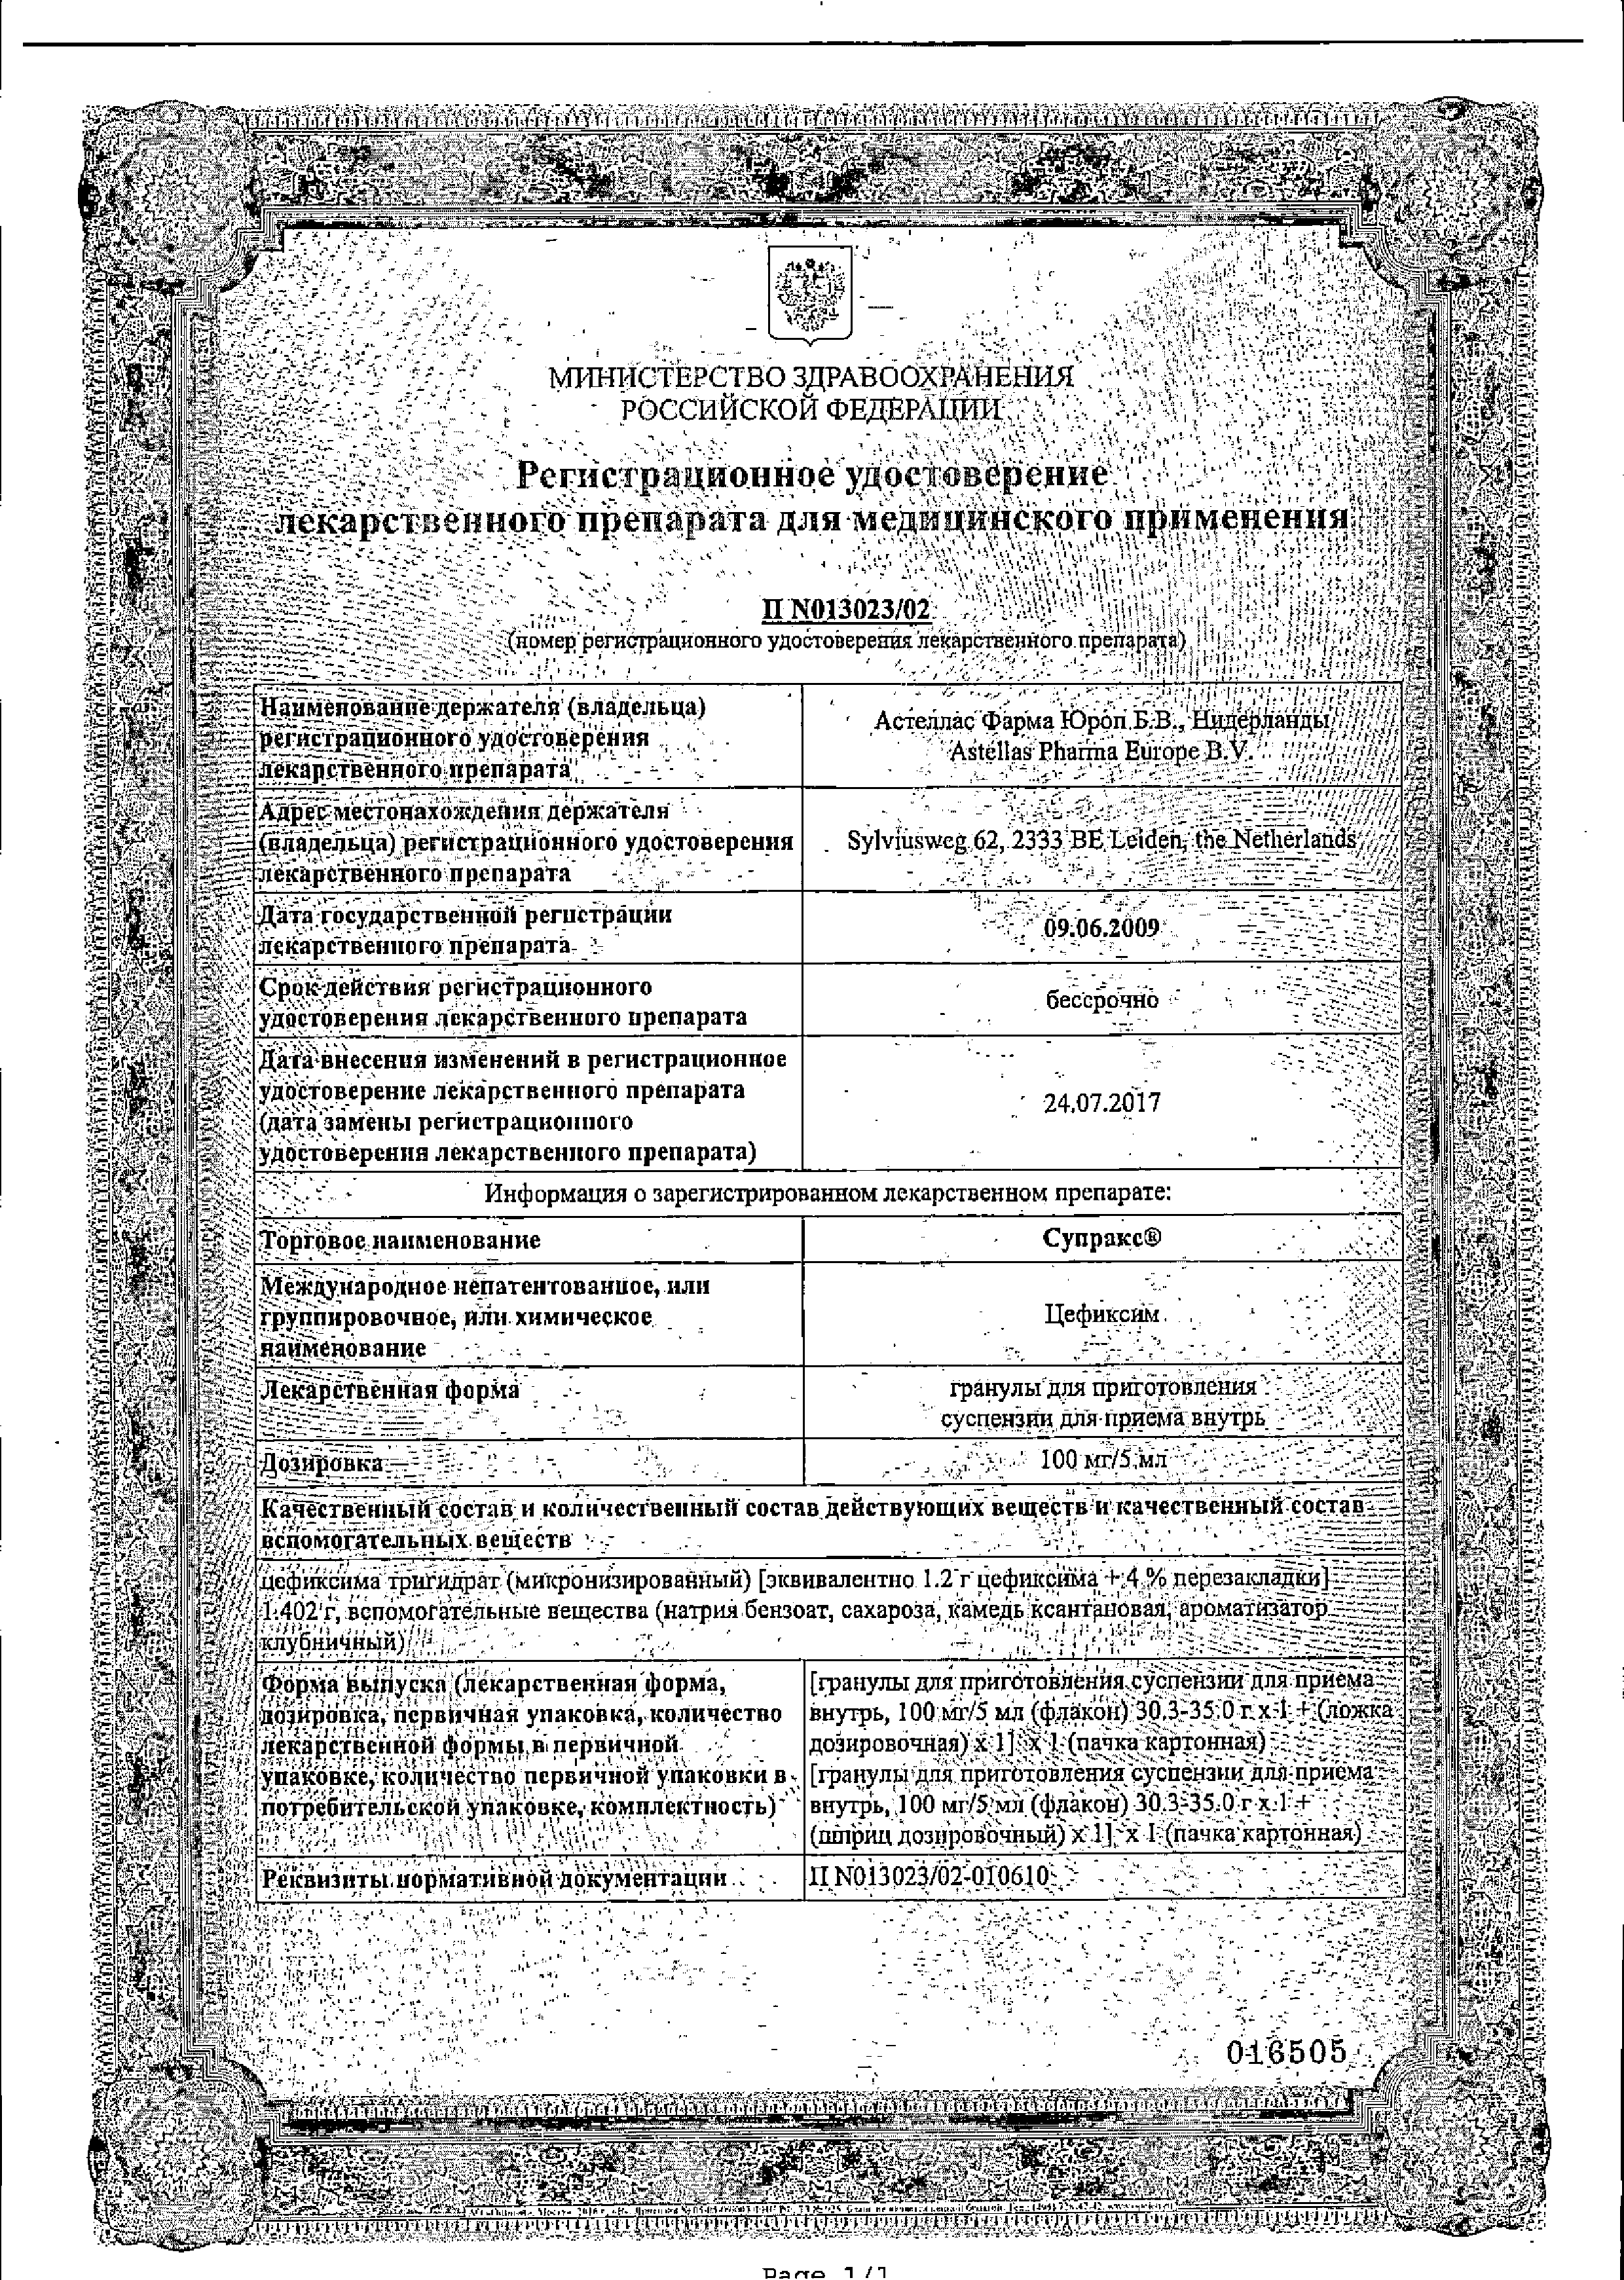 Супракс сертификат